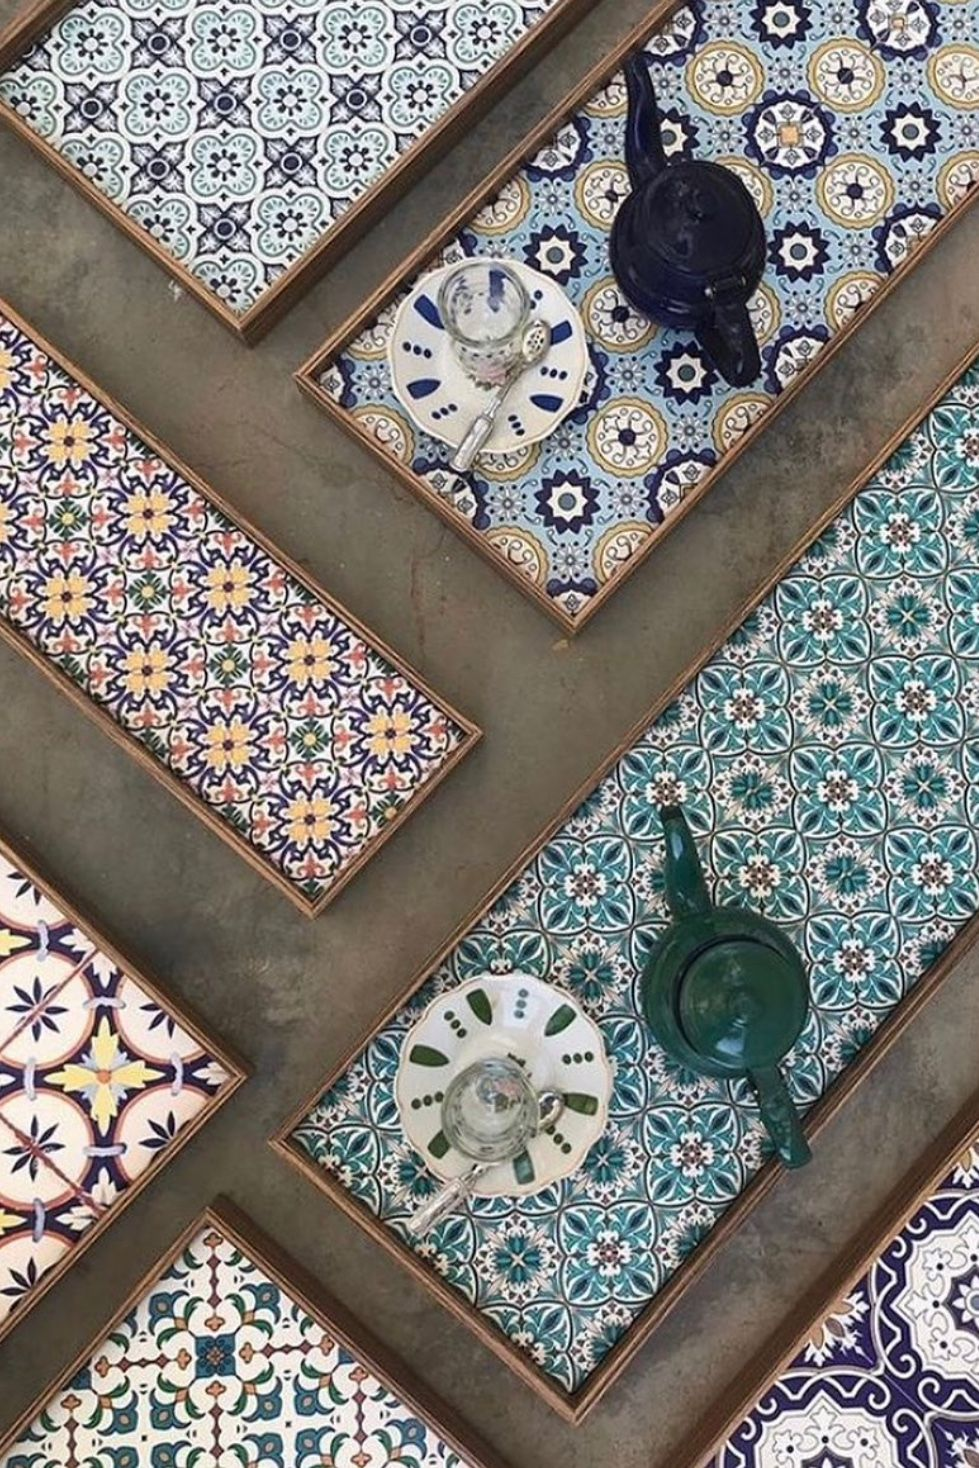 Sinwan صنوان Findinksa In 2021 Home Decor Decor Inspiration